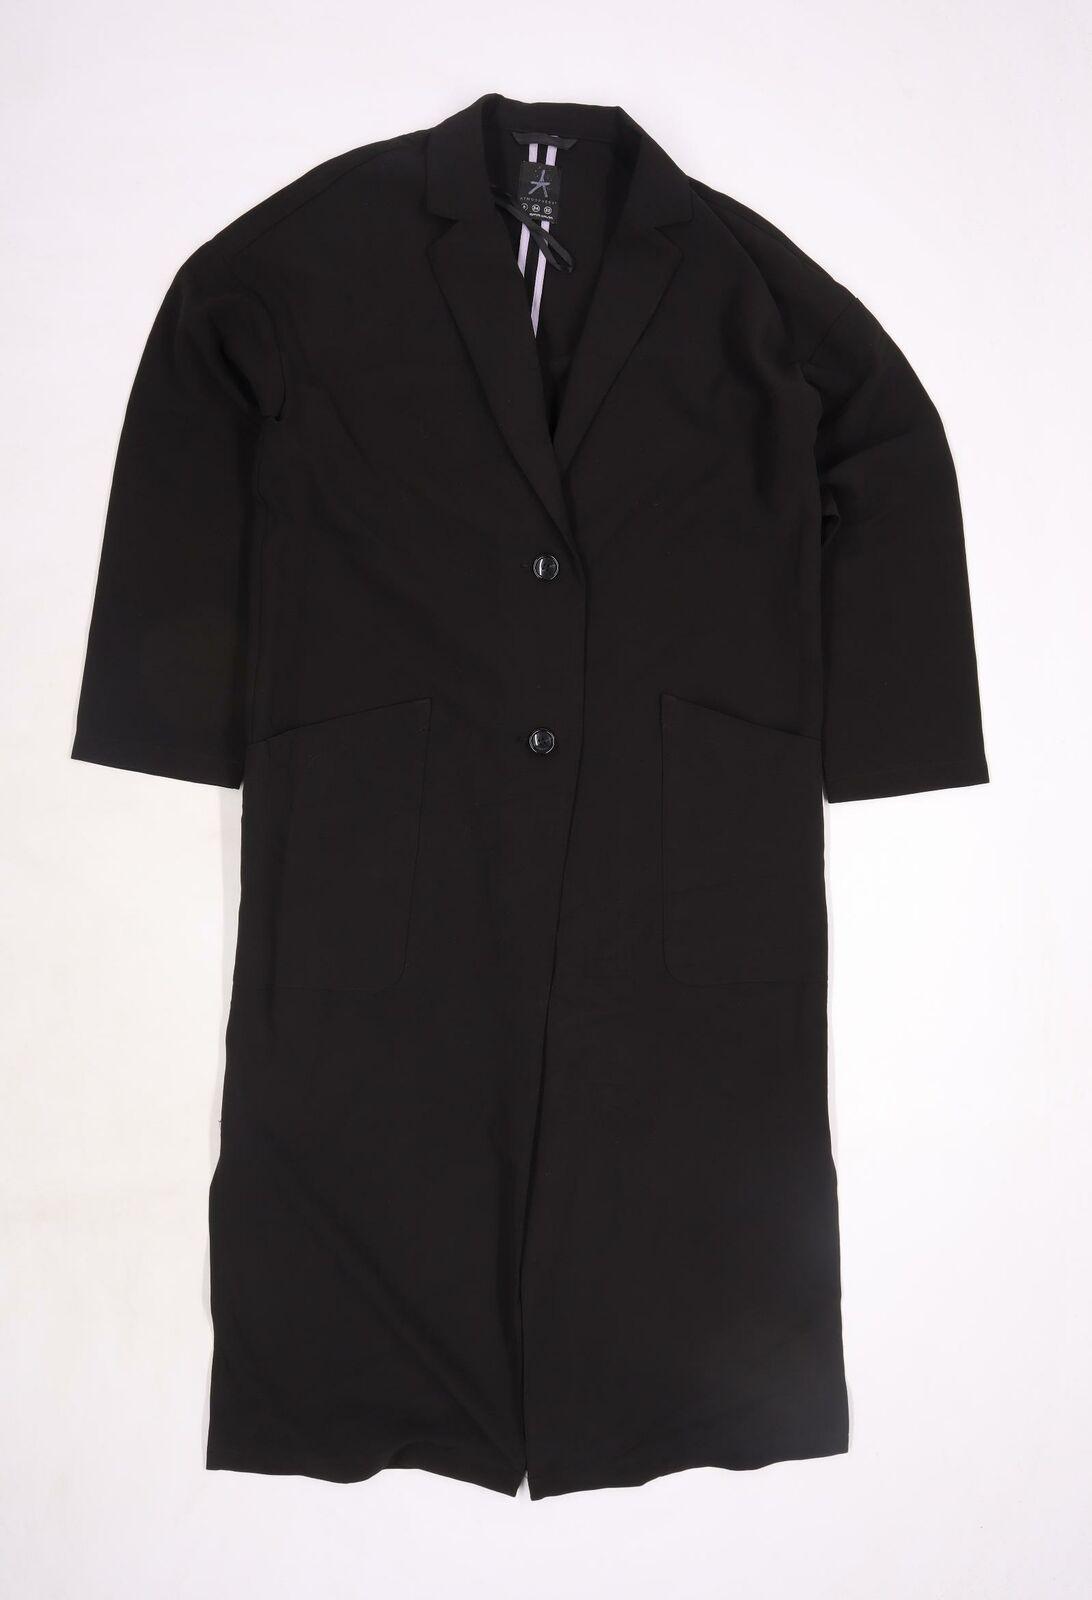 Atmosphere Womens Black Rayon Overcoat Jacket Size 8